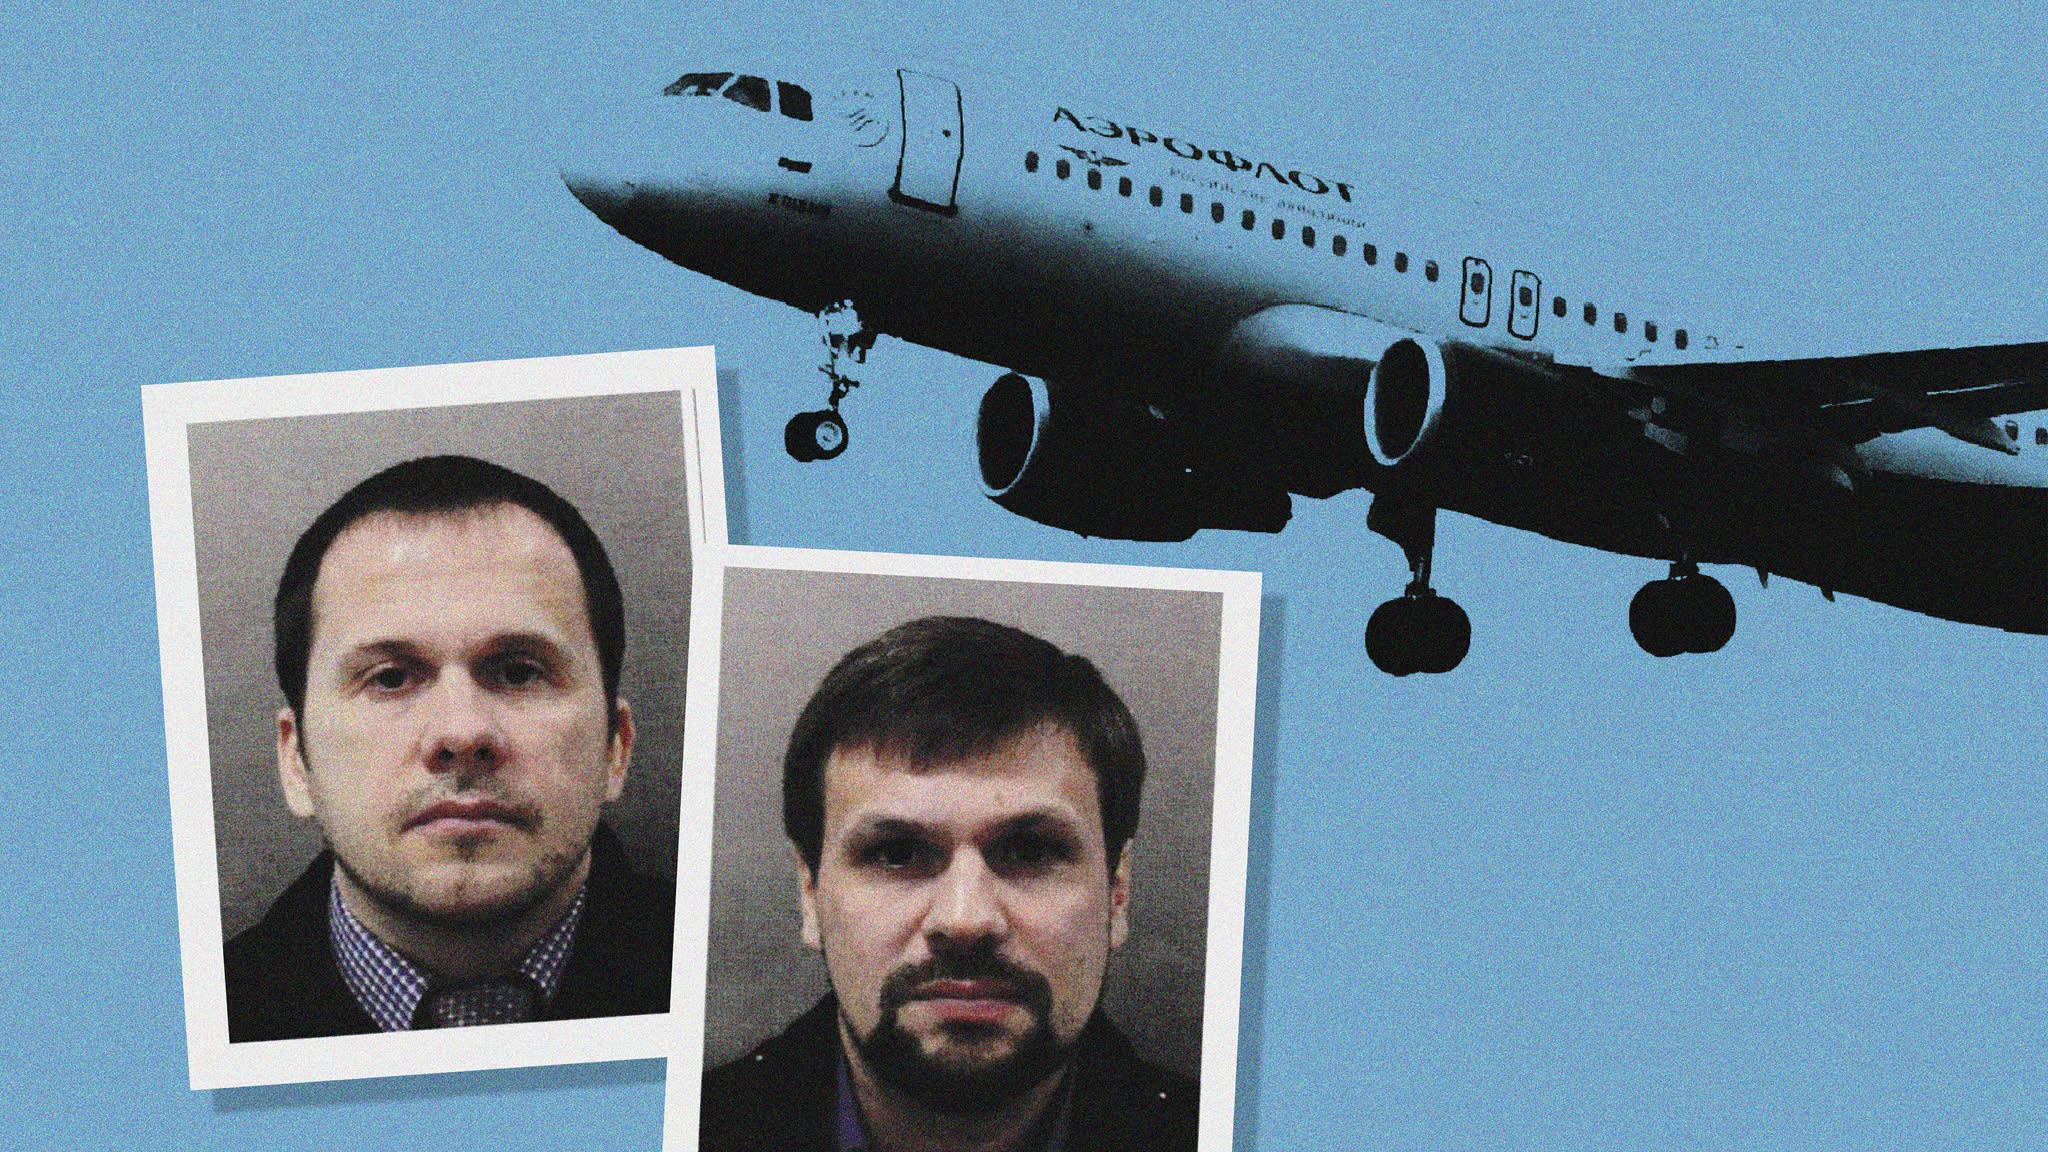 Putin says Kremlin knows men accused of Skripal attack